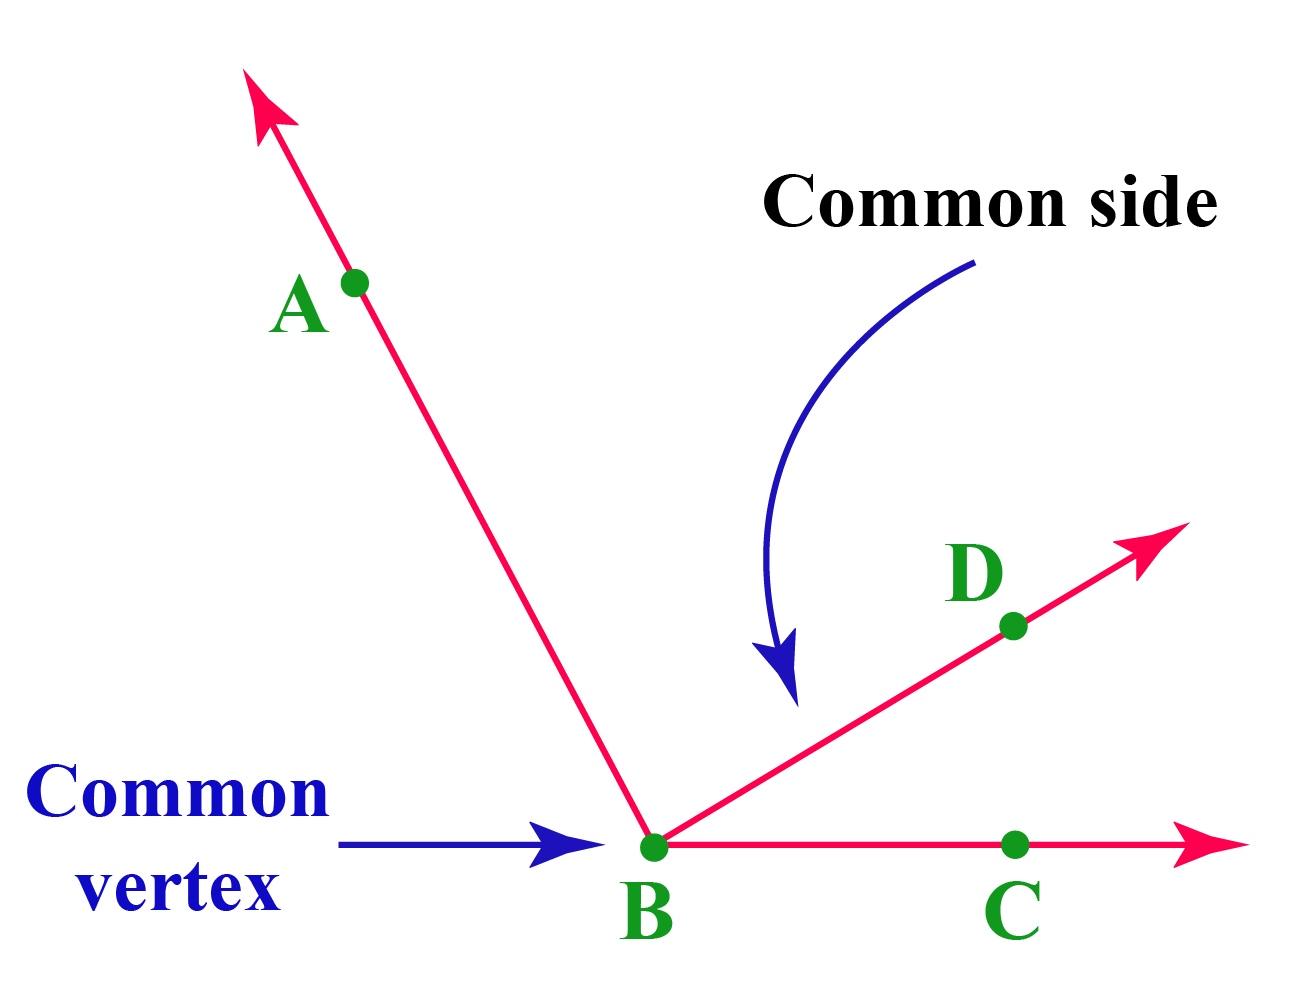 Adjacent angles, common vertex